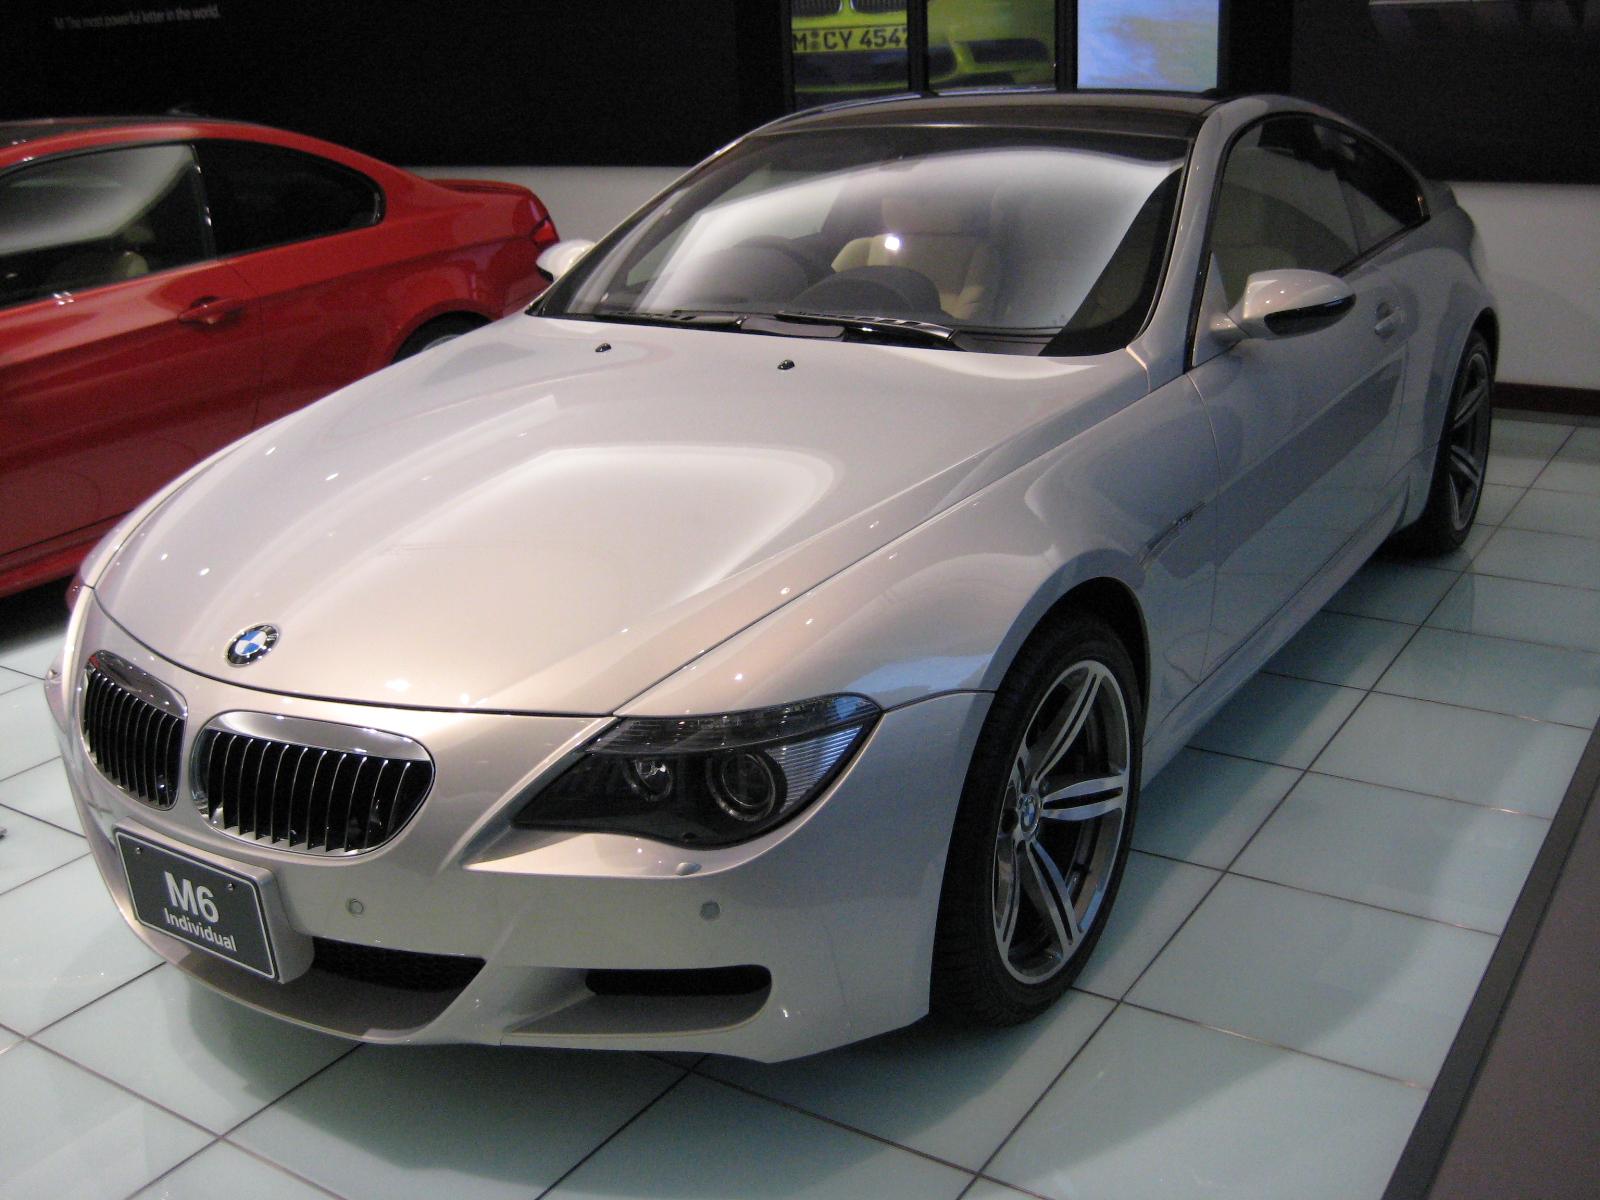 BMW_E63_M6_Coup%C3%A9.JPG